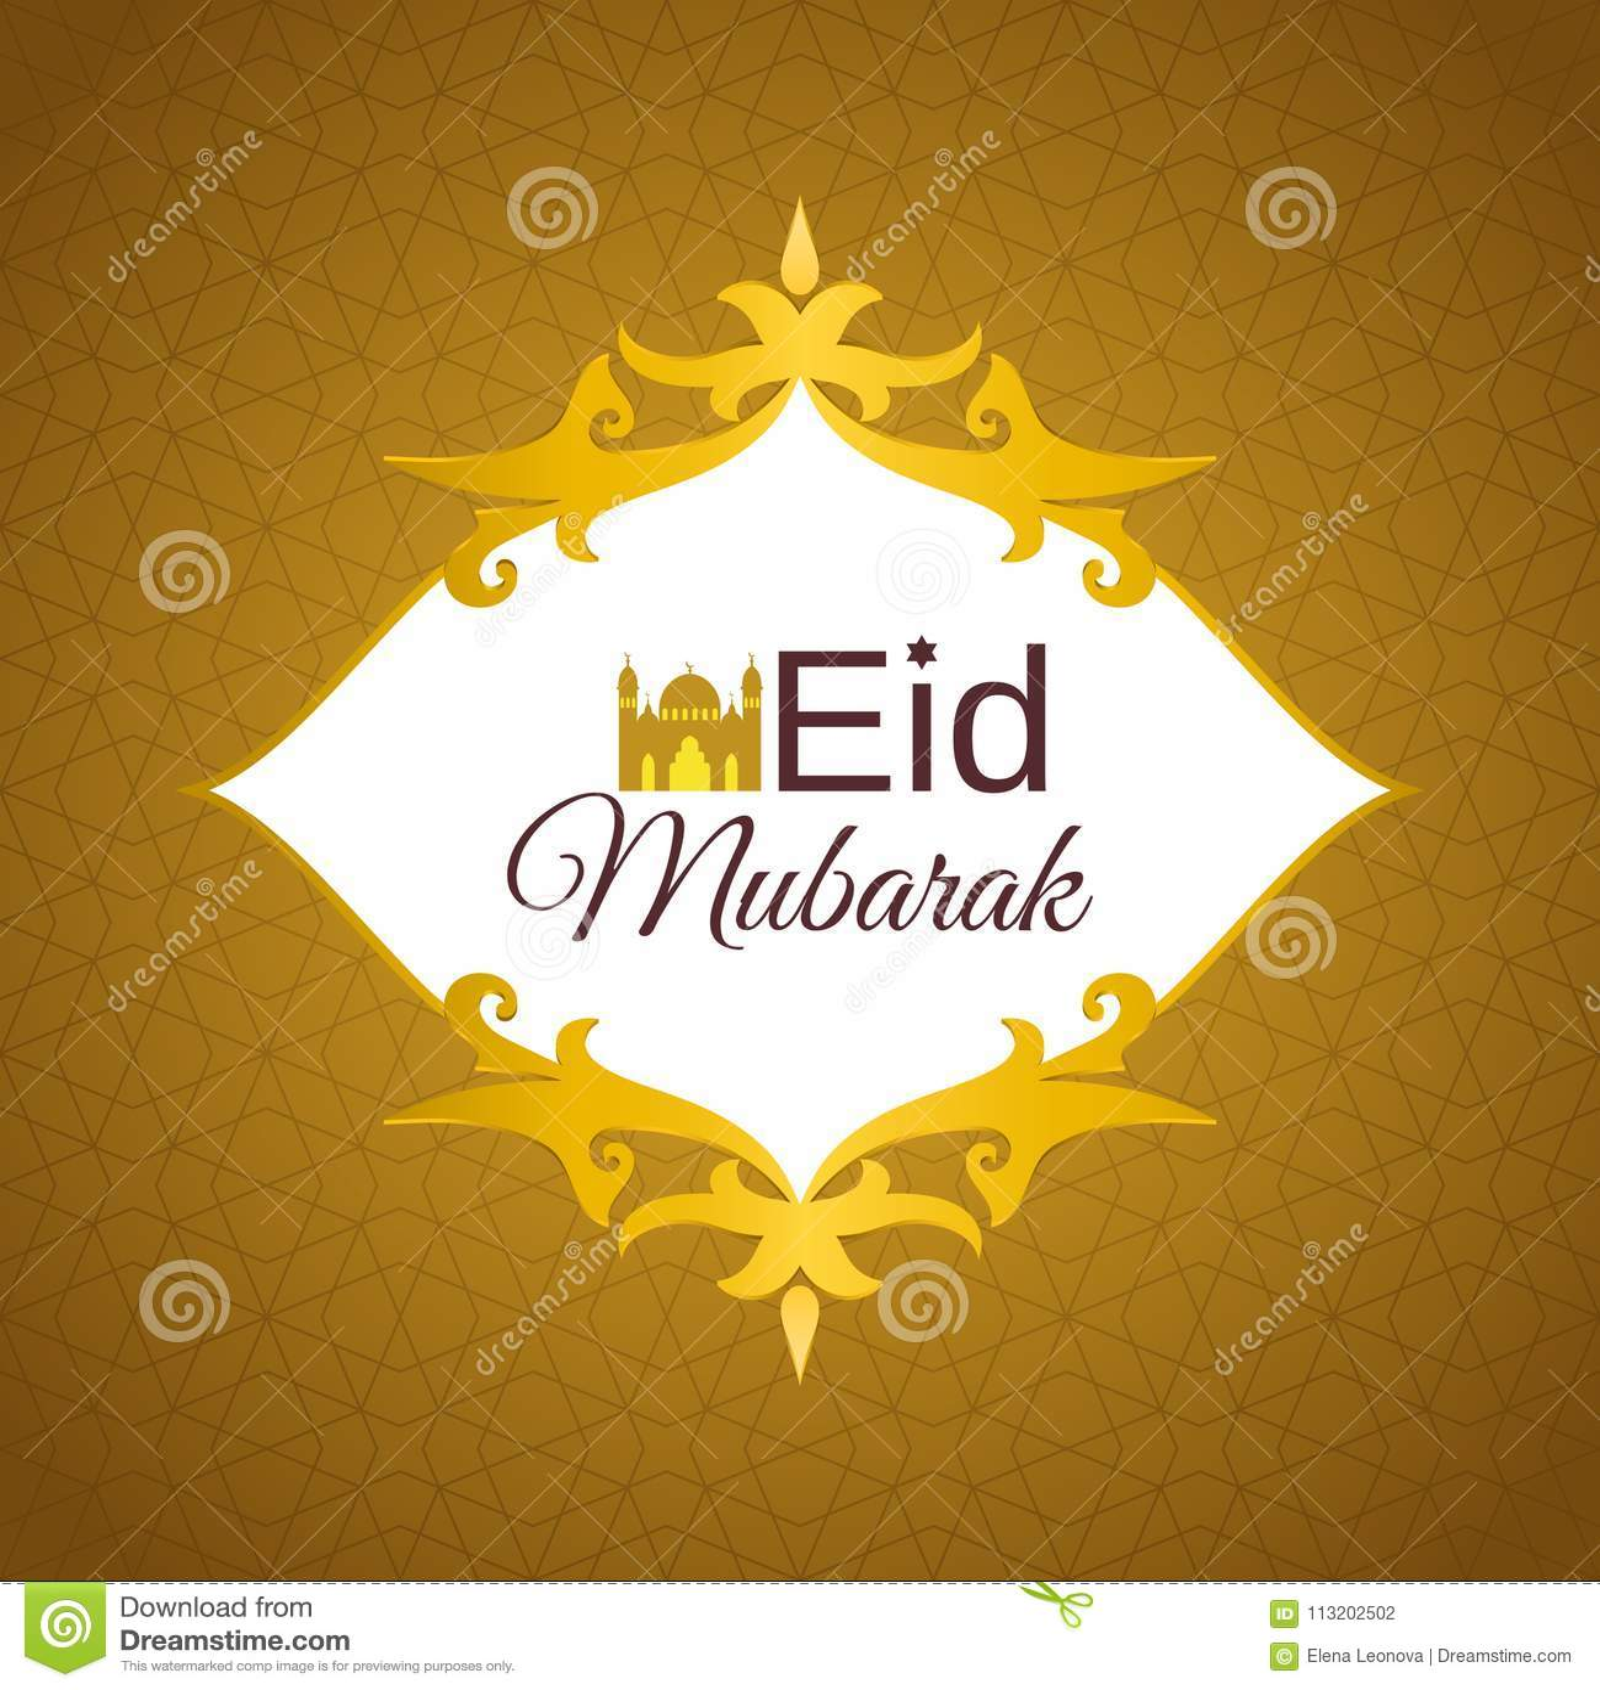 Eid mubarak greeting card with islamic geometric patterns stock eid mubarak greeting card with islamic geometric patterns m4hsunfo